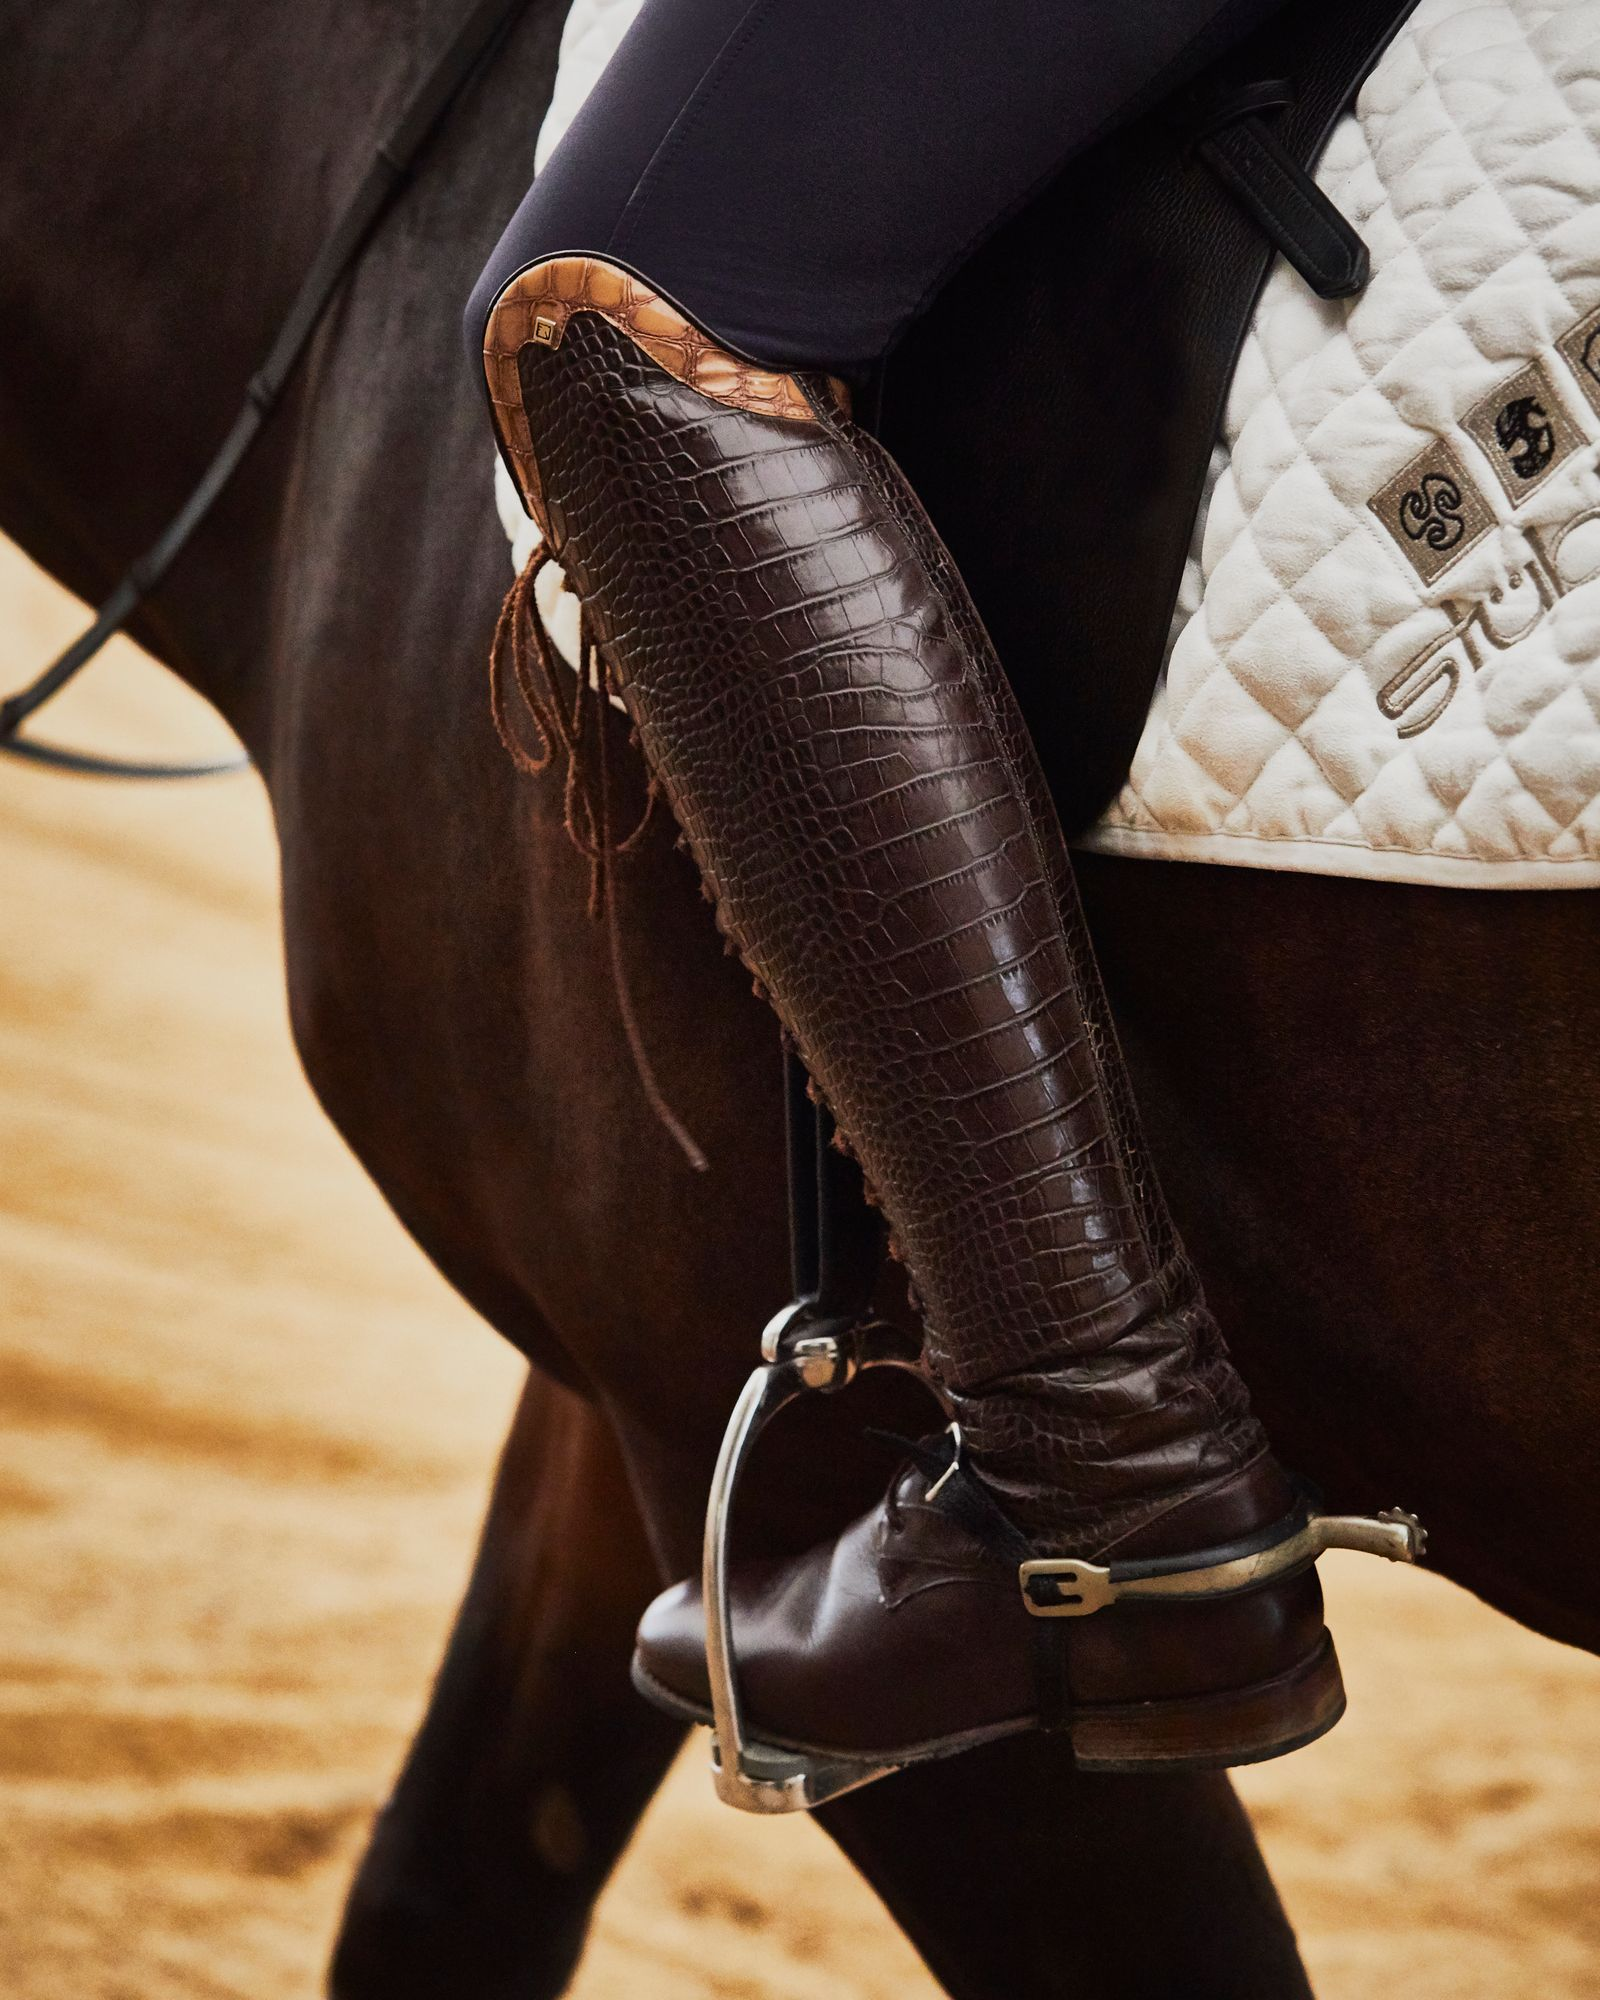 JR_NBH_Dressage_Horse_091318_0900.jpg